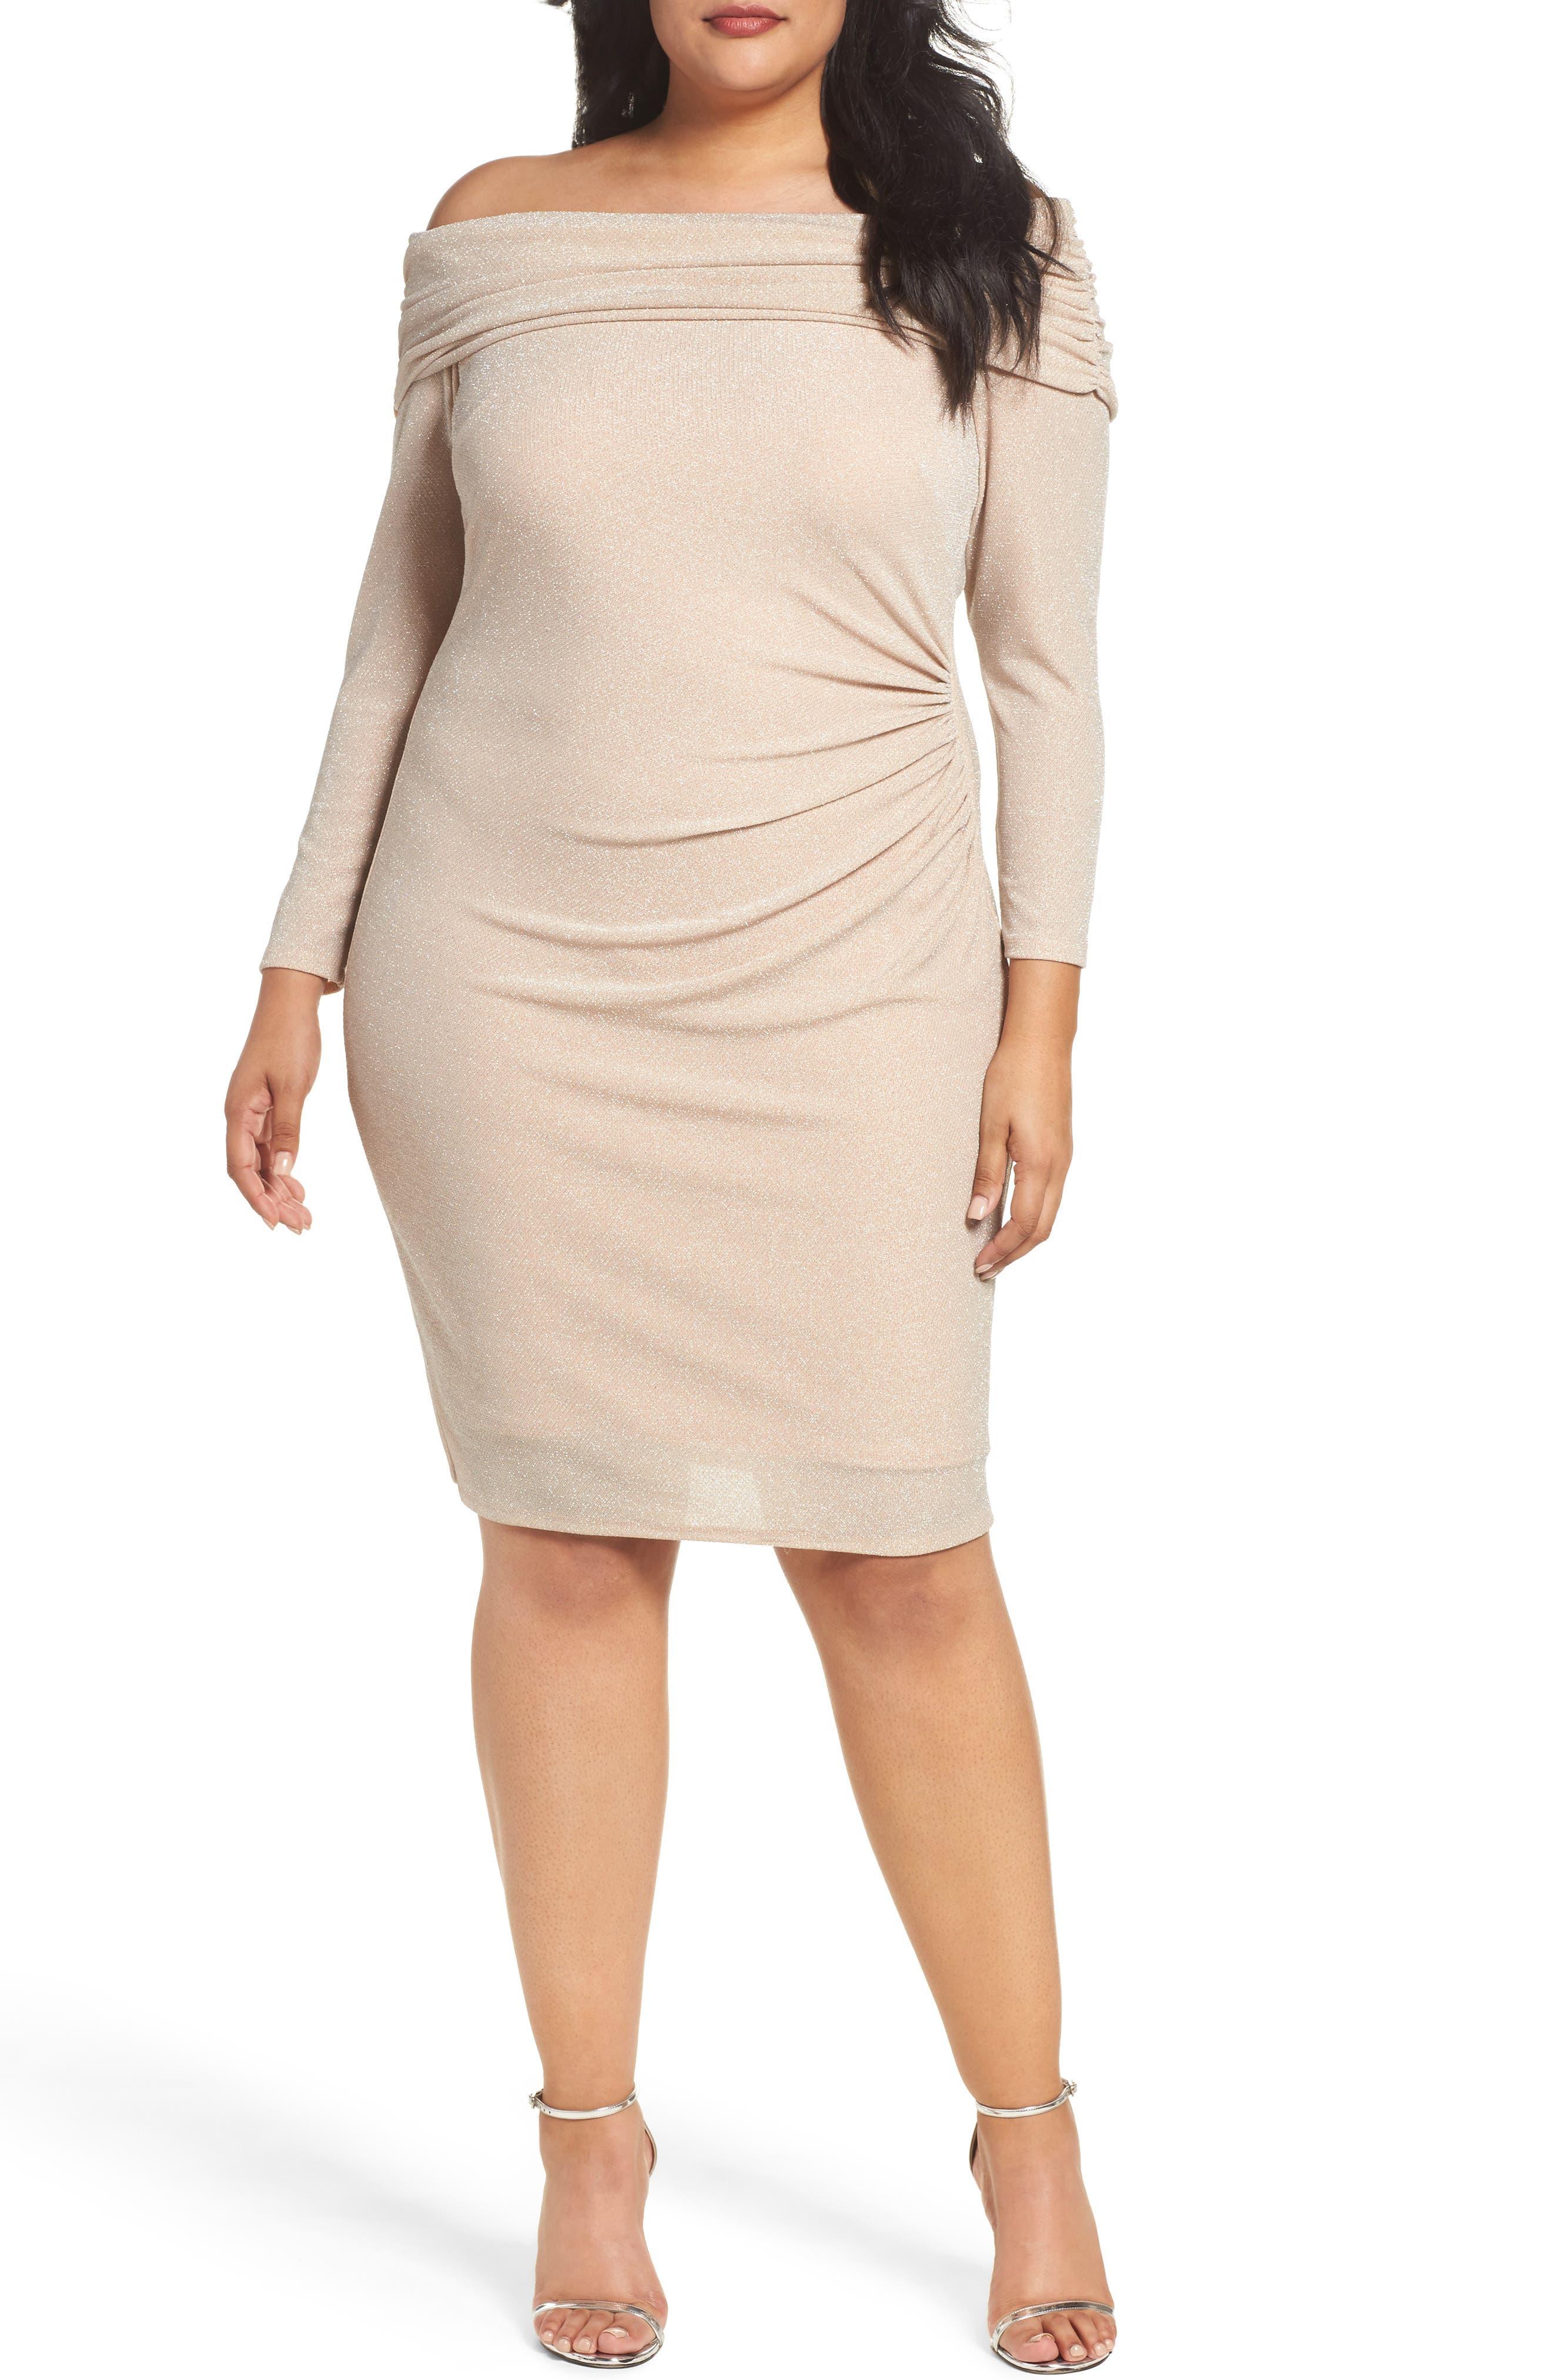 Alternate Image 1 Selected - Eliza J Off the Shoulder Metallic Knit Sheath Dress (Plus Size)